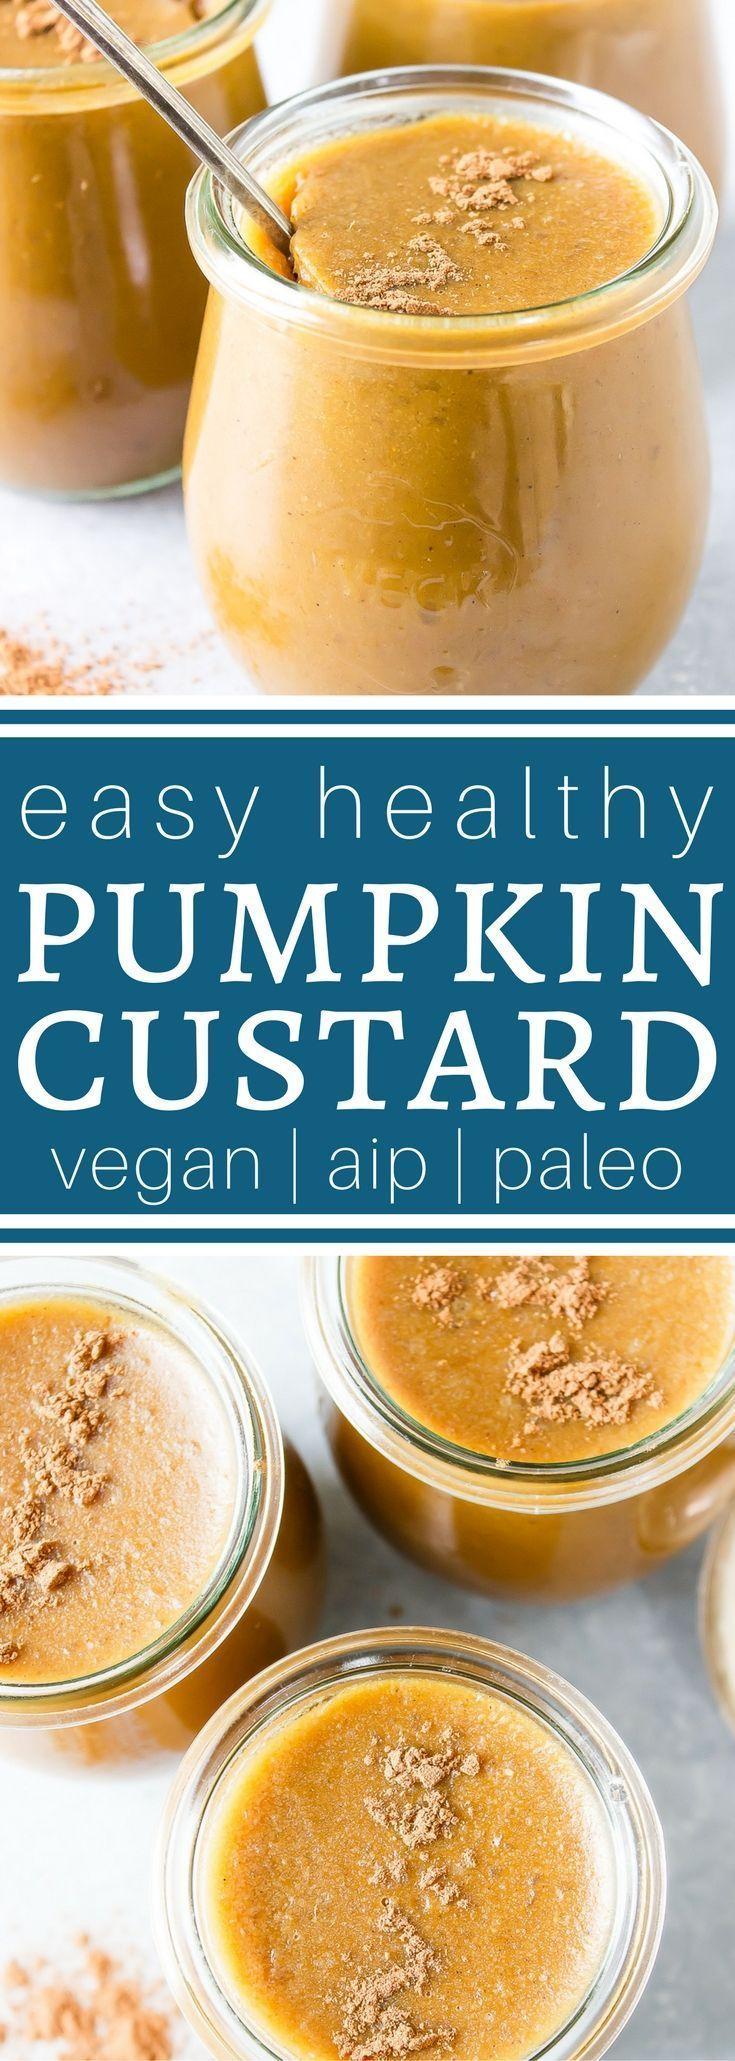 Healthy Pumpkin Custard - paleo, vegan, dairy-free, egg-free, AIP, low-carb & THM:S